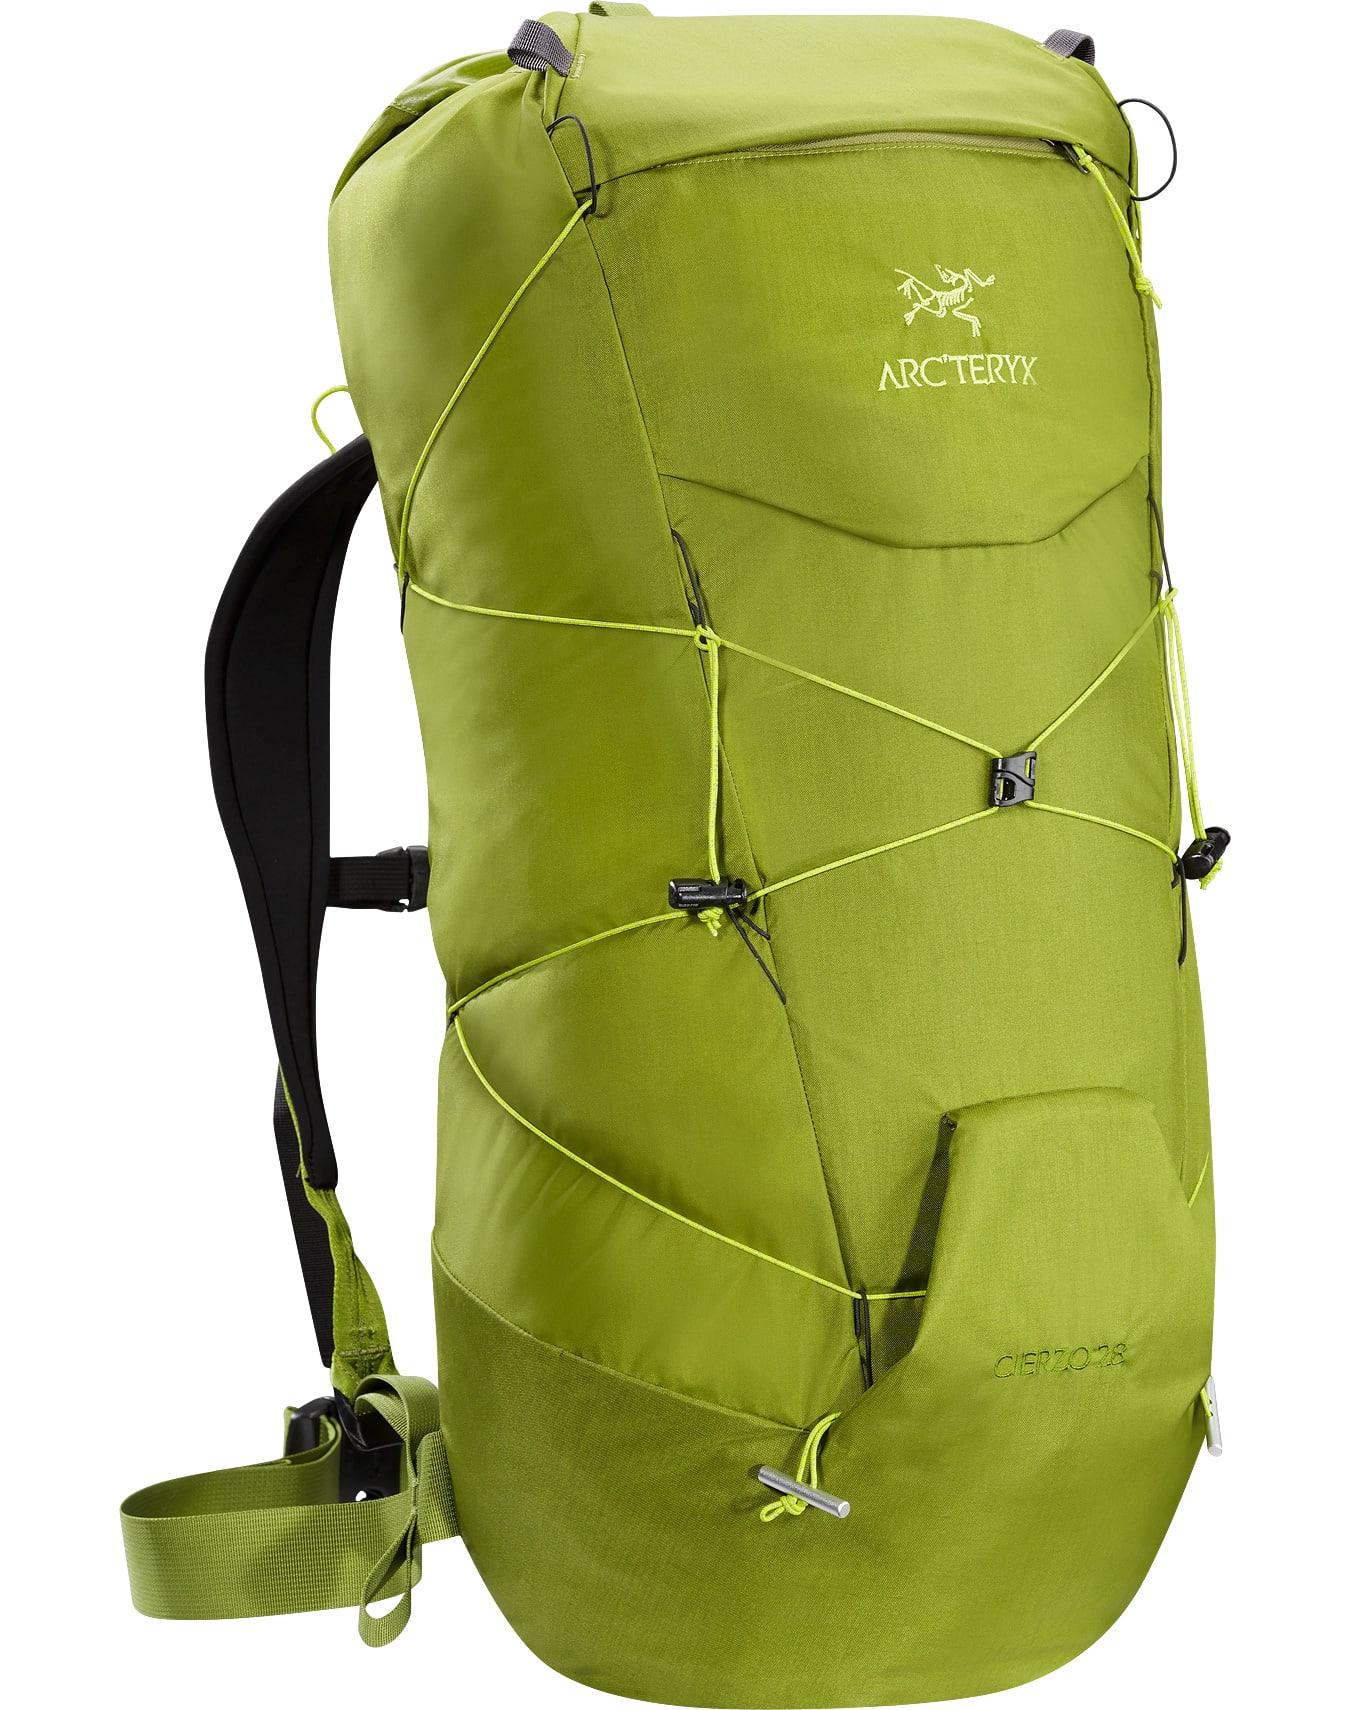 Image of Arc'teryx Cierzo 28 Backpack